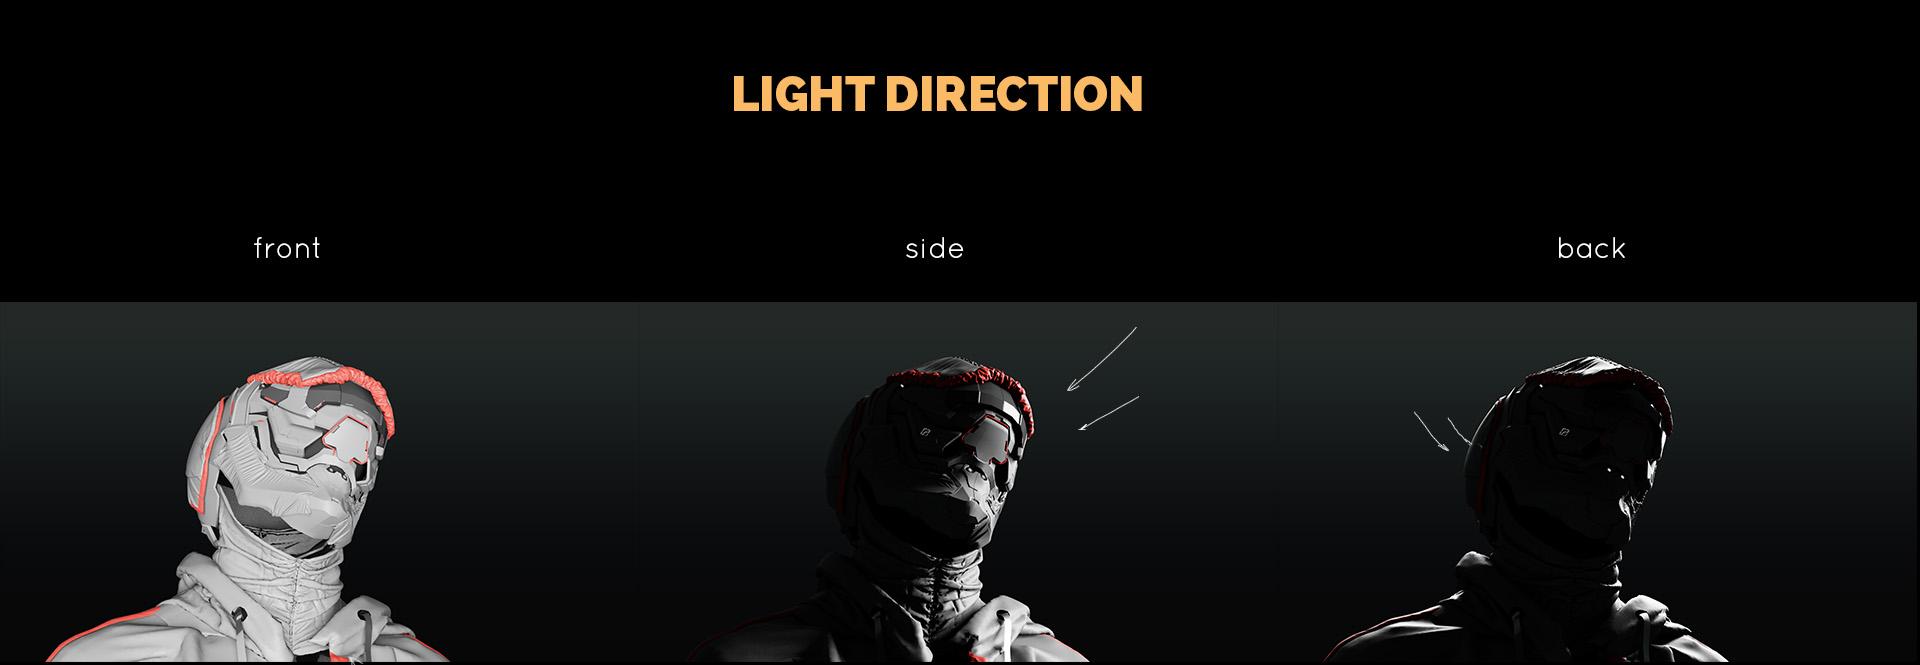 lighting tutorial direction